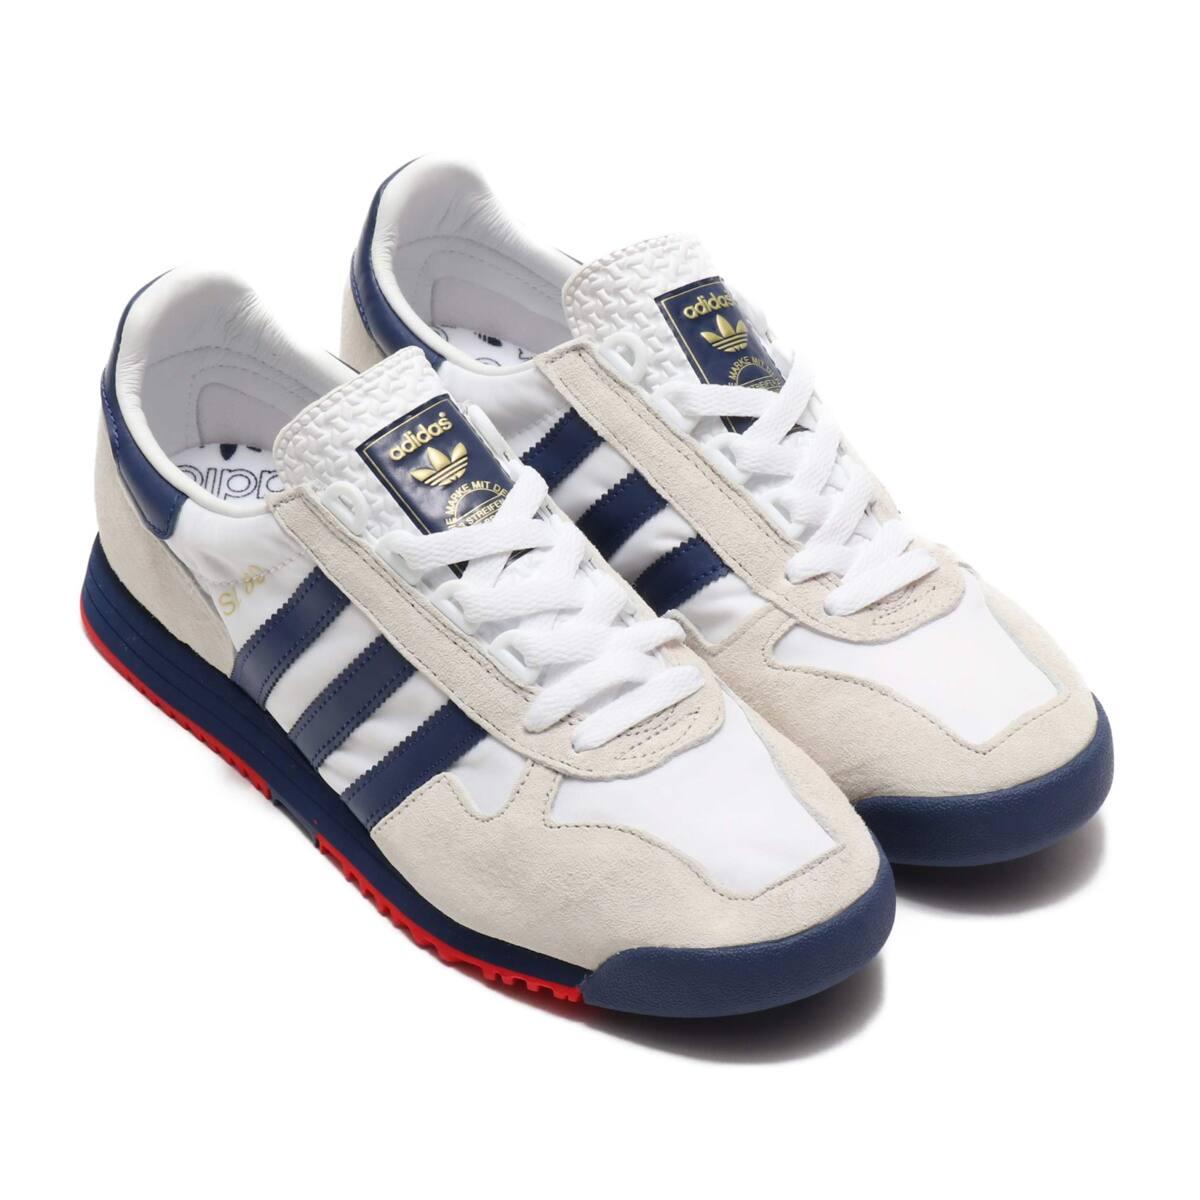 adidas SL 80 FOOTWEAR WHITE/TECH INDIGO/ORBIT GRAY 20SS-S_photo_large